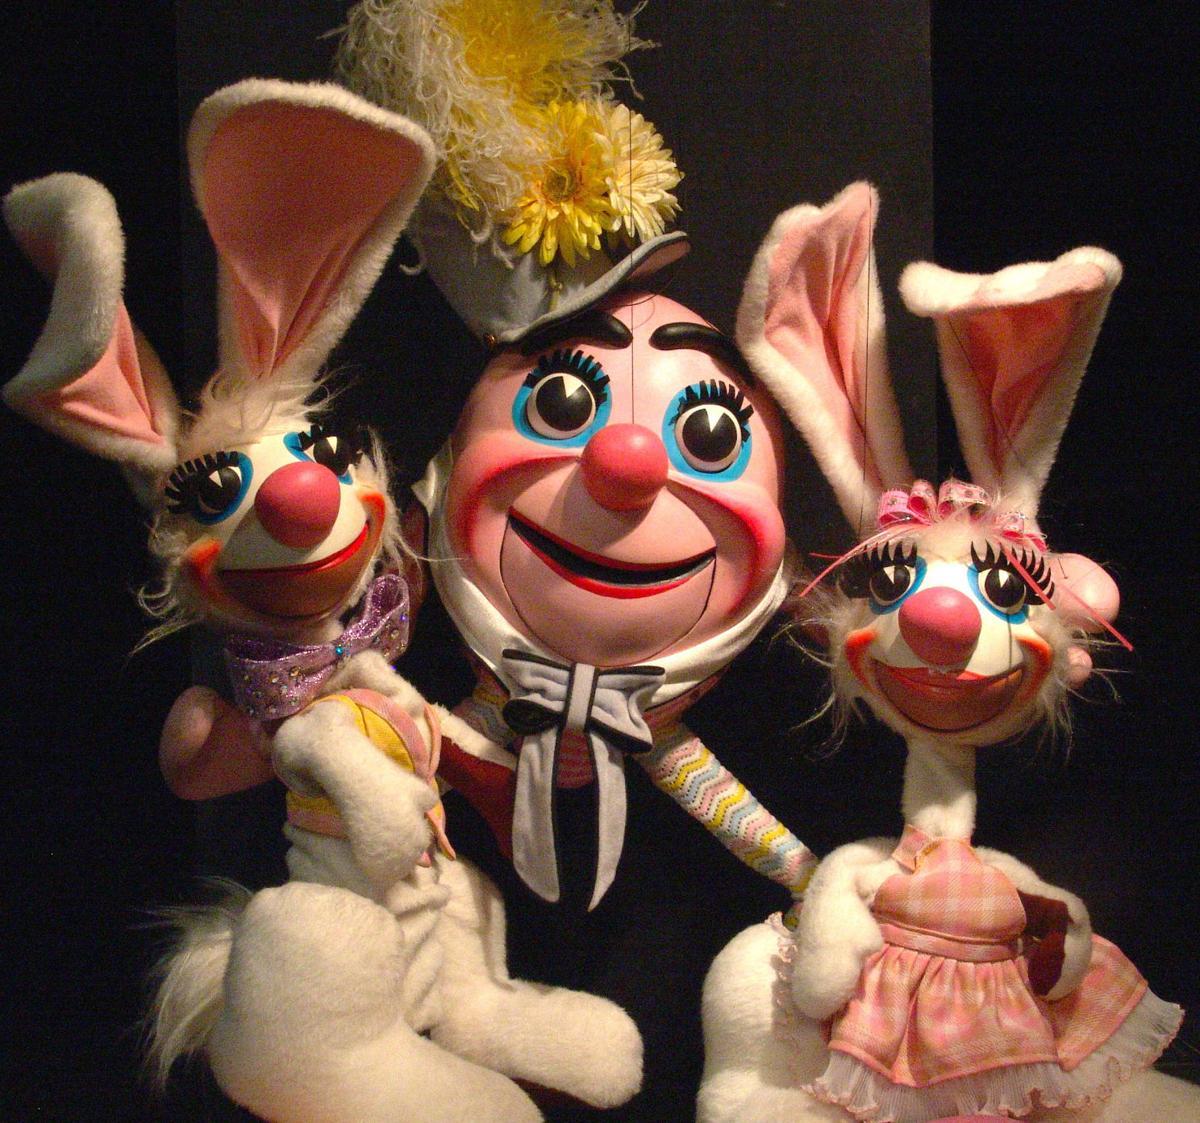 Kramer Marionnettes' Humpty & the Bunnies